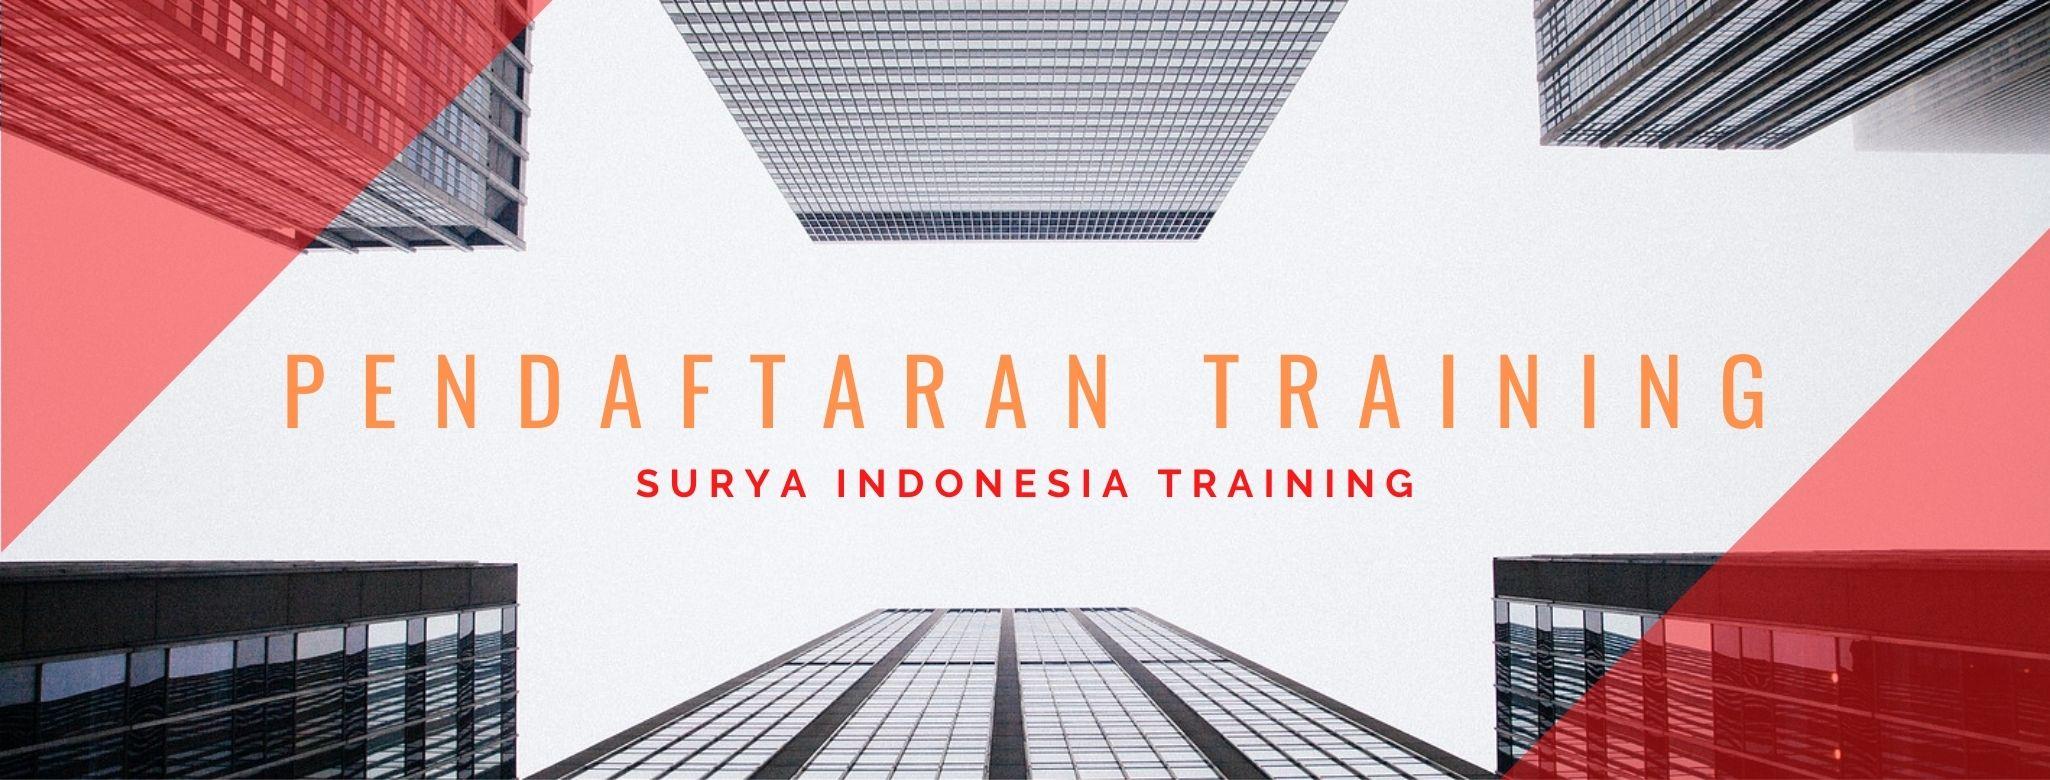 surya indonesia training